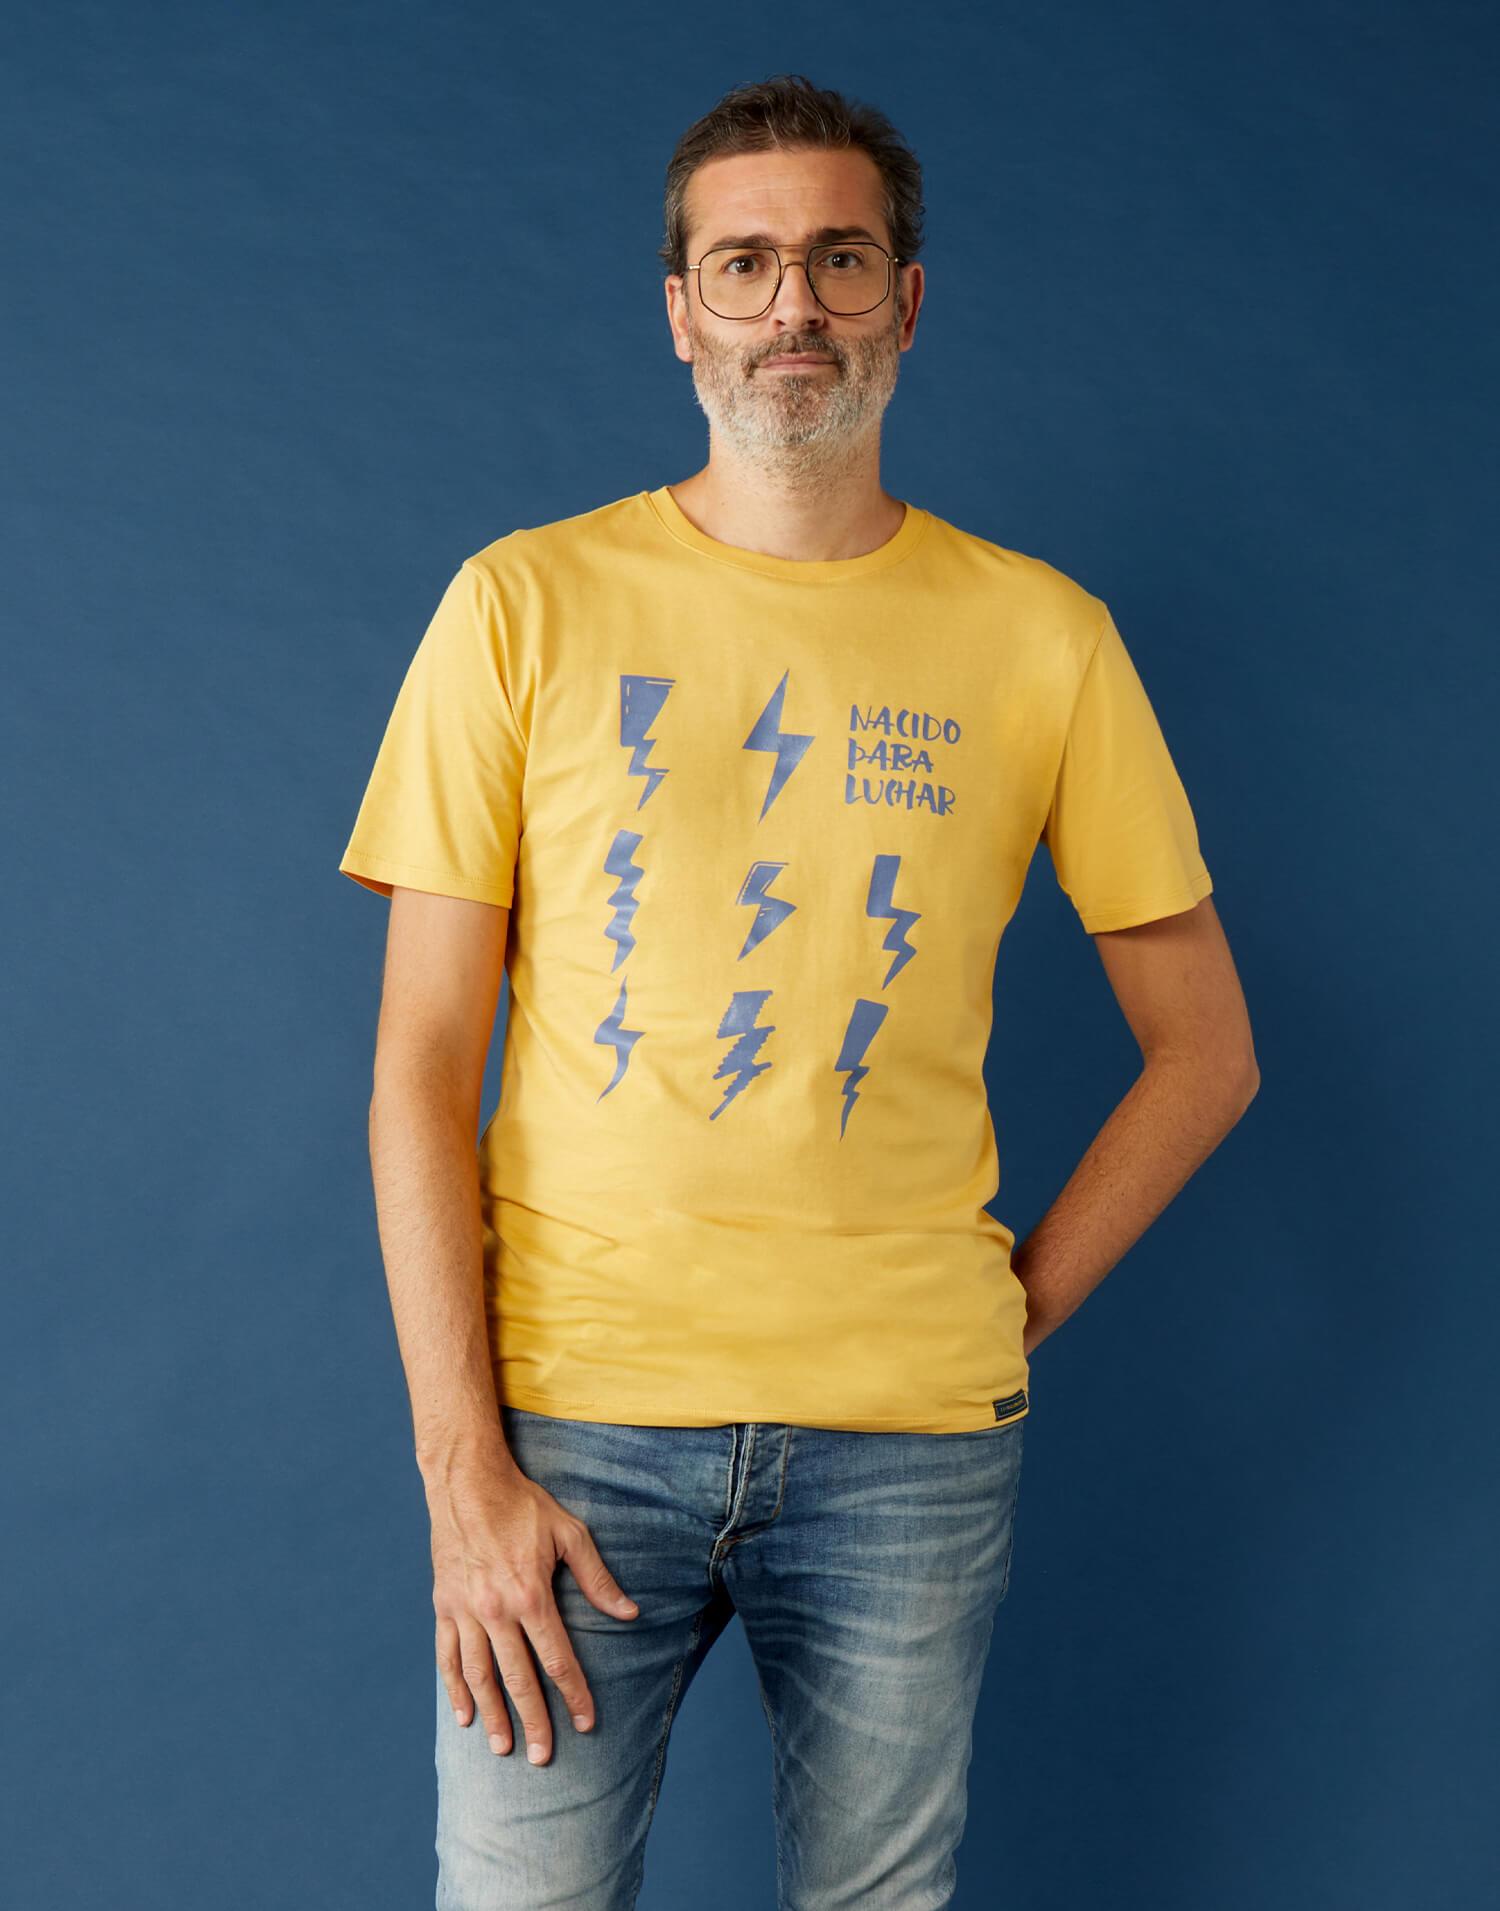 Camiseta buenpadre 'Nacido Para Luchar'